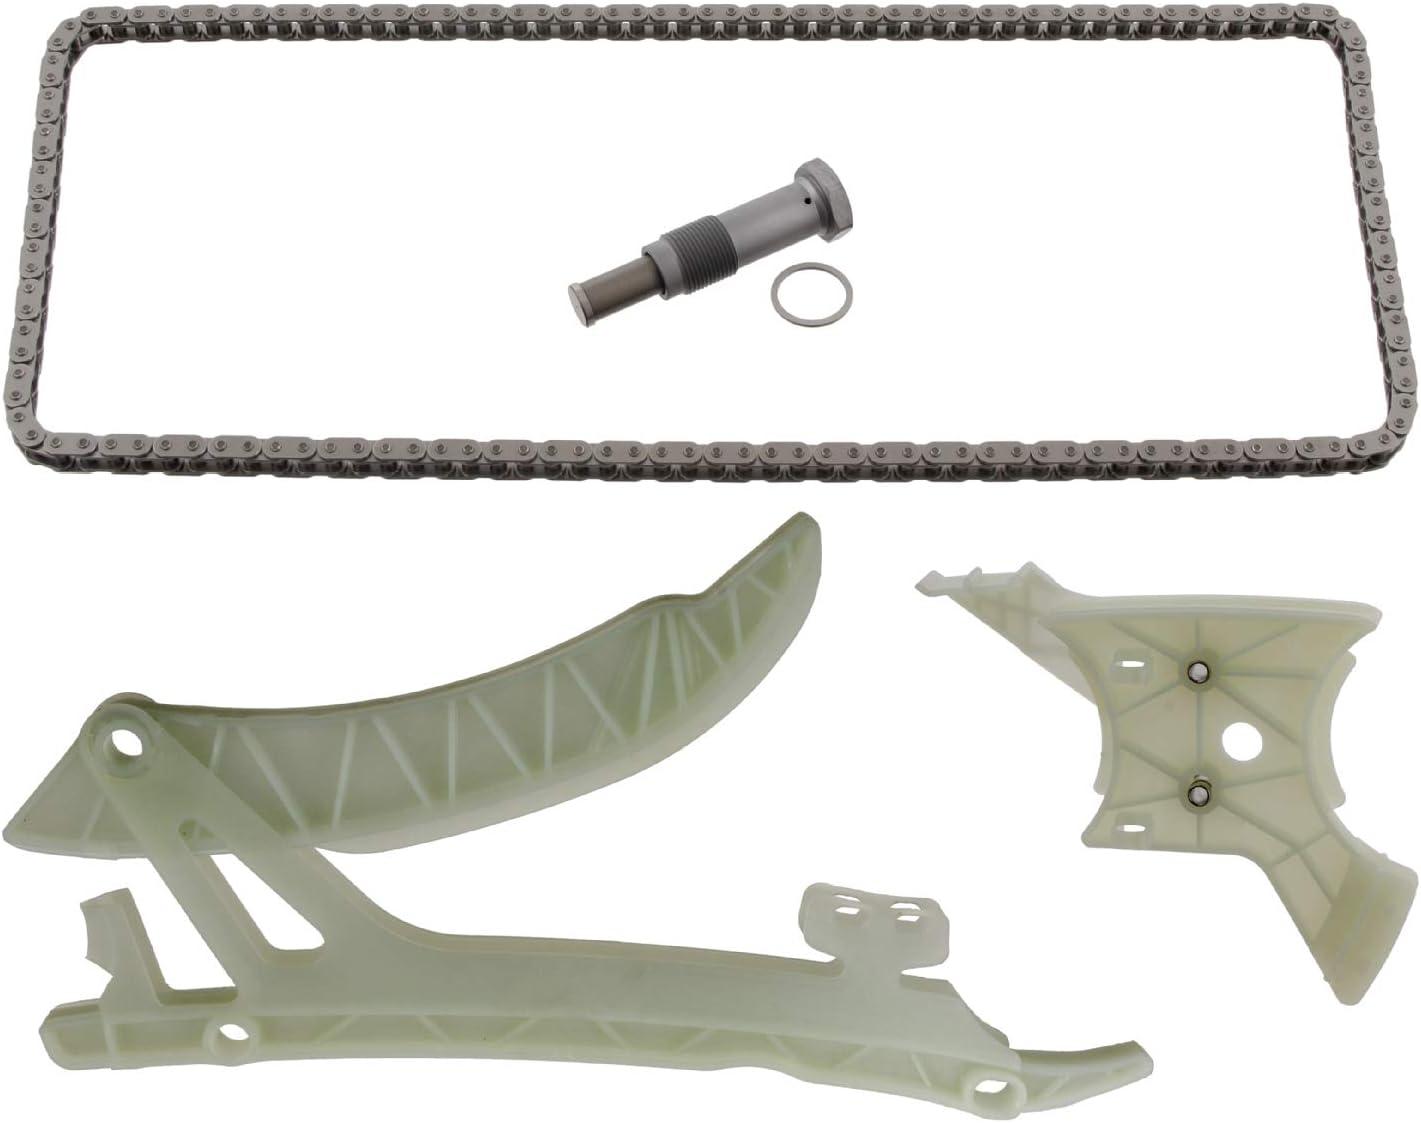 Timing Parts Febi Bilstein Timing Chain Kit 33846 Chains